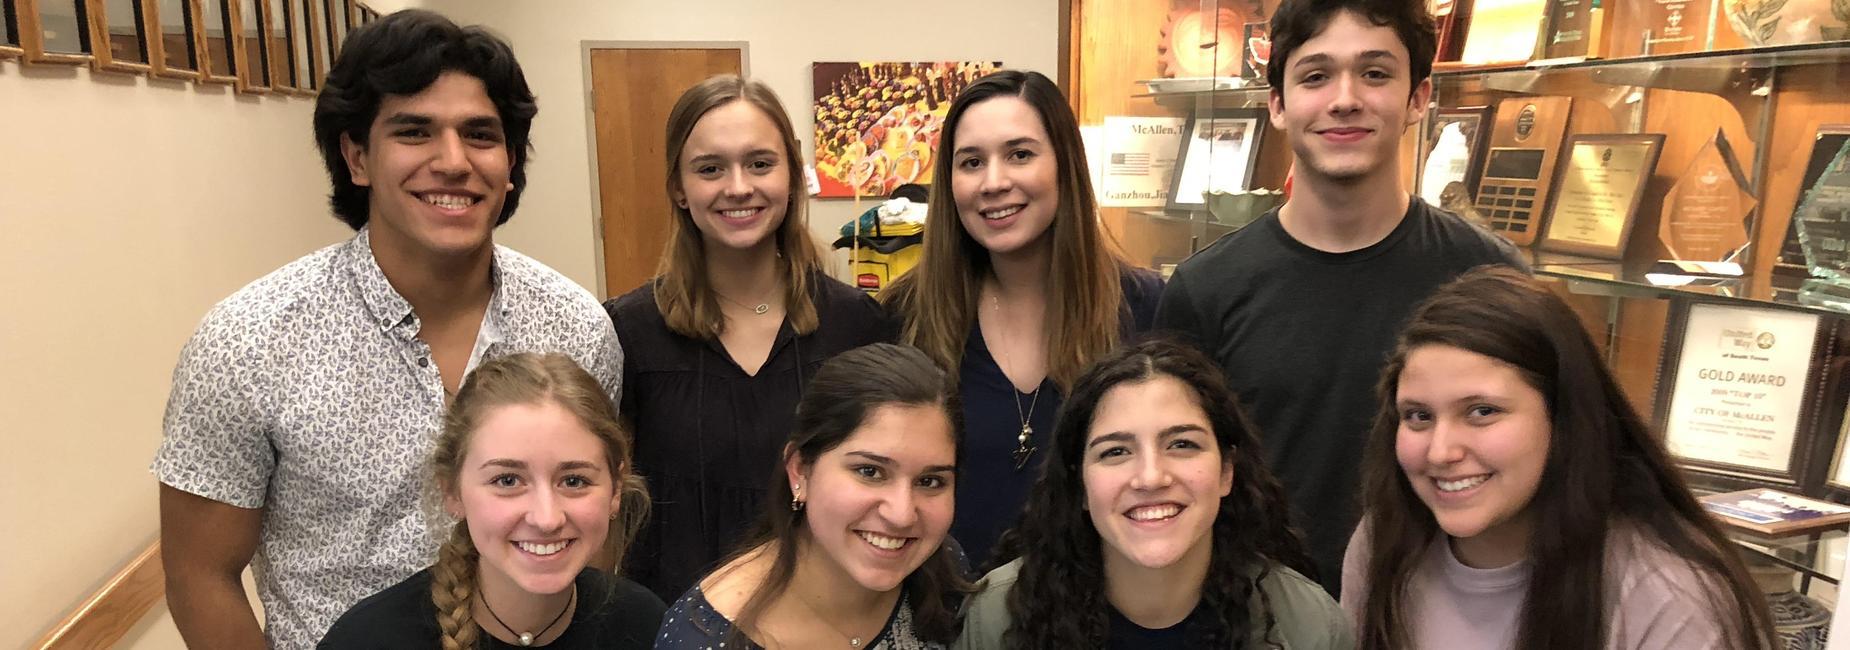 student council members and sponsor posing